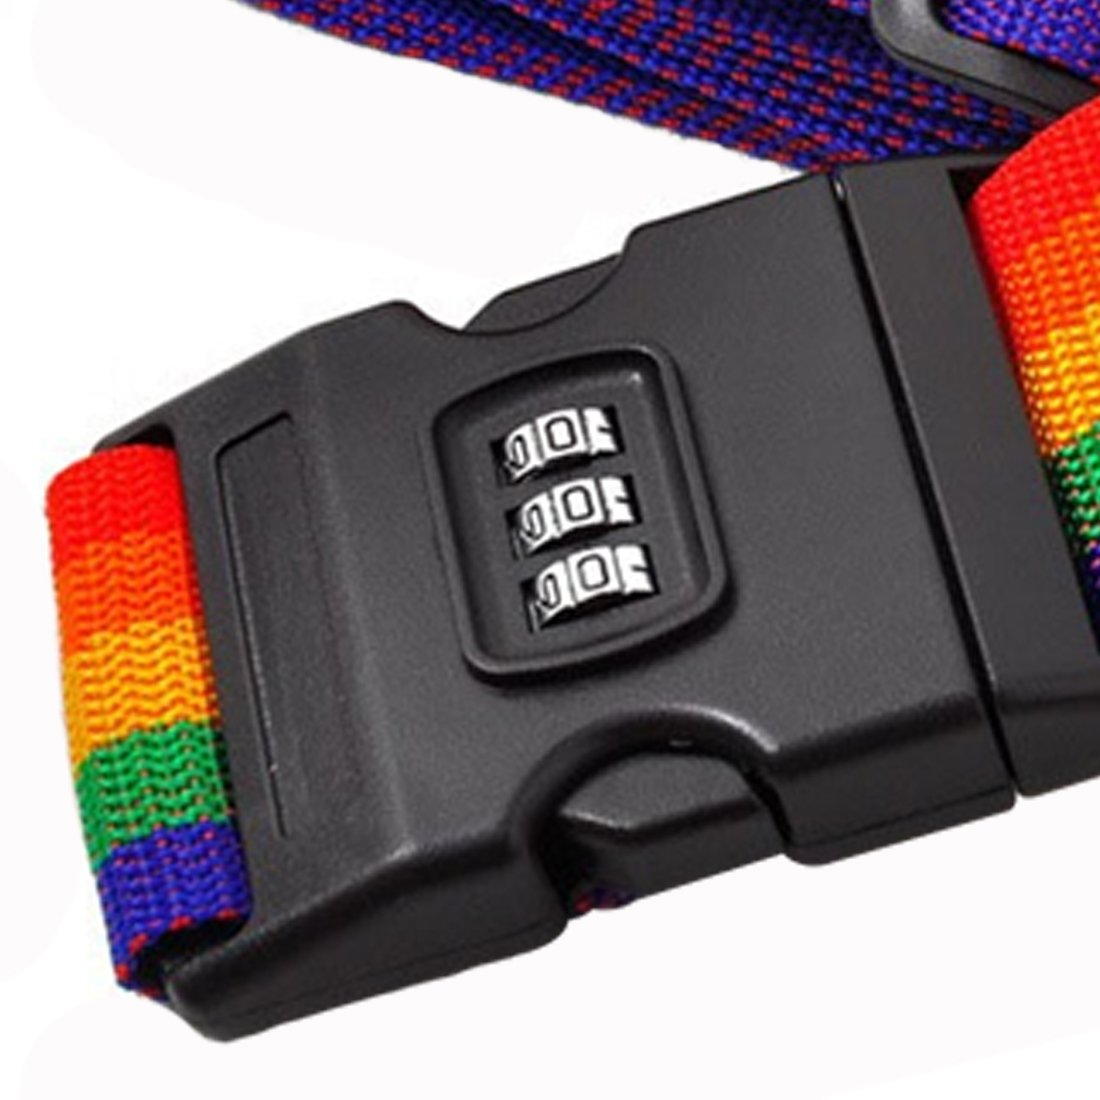 Fishing-Accessories Password Lock Adjustable Nylon Travel Luggage Backpack Bag Luggage Suitcase Straps Baggage Rainbow Belt Adjustable